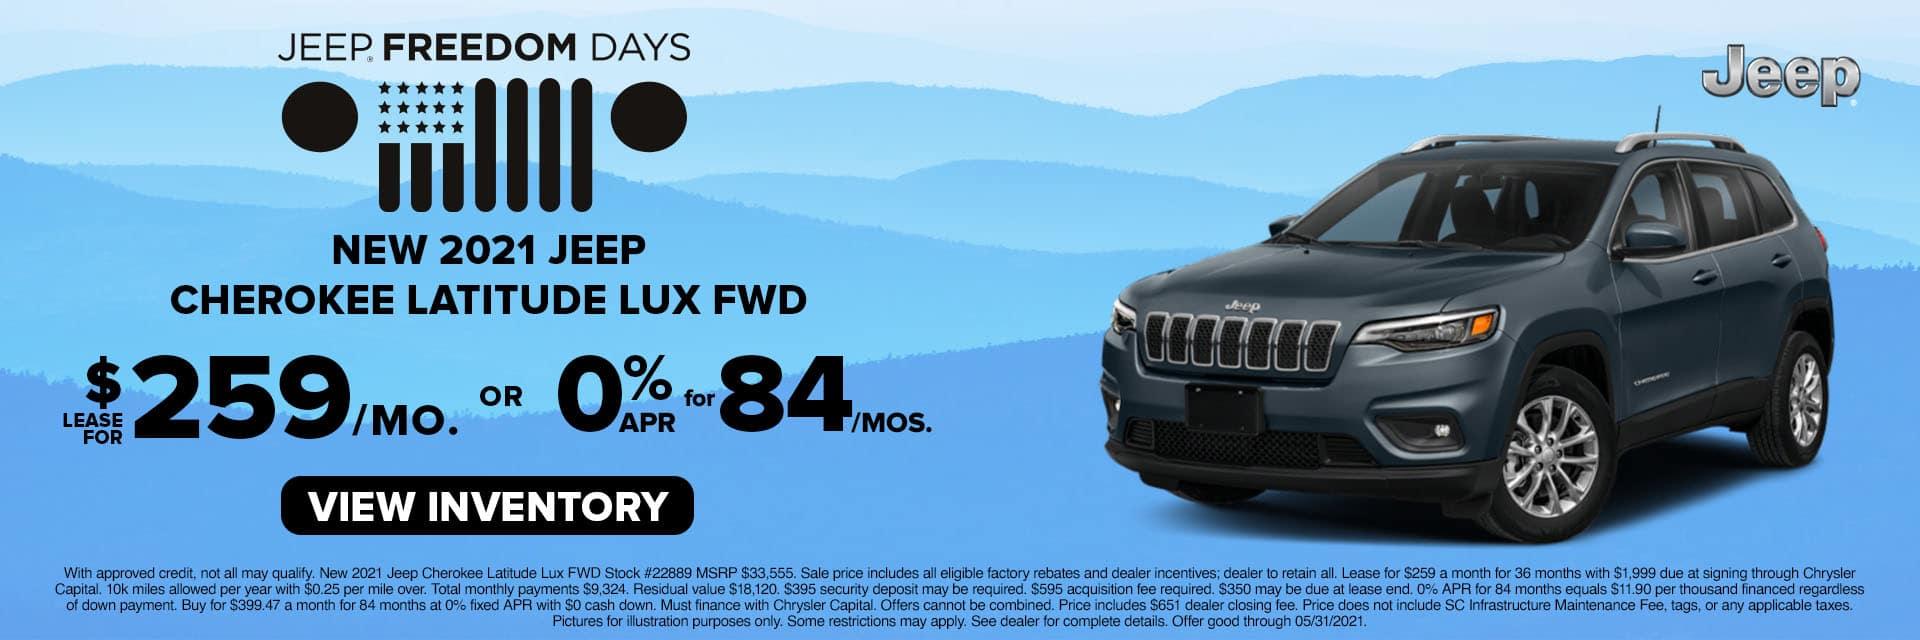 SLCJ-May 2021-2021 Jeep Cherokee